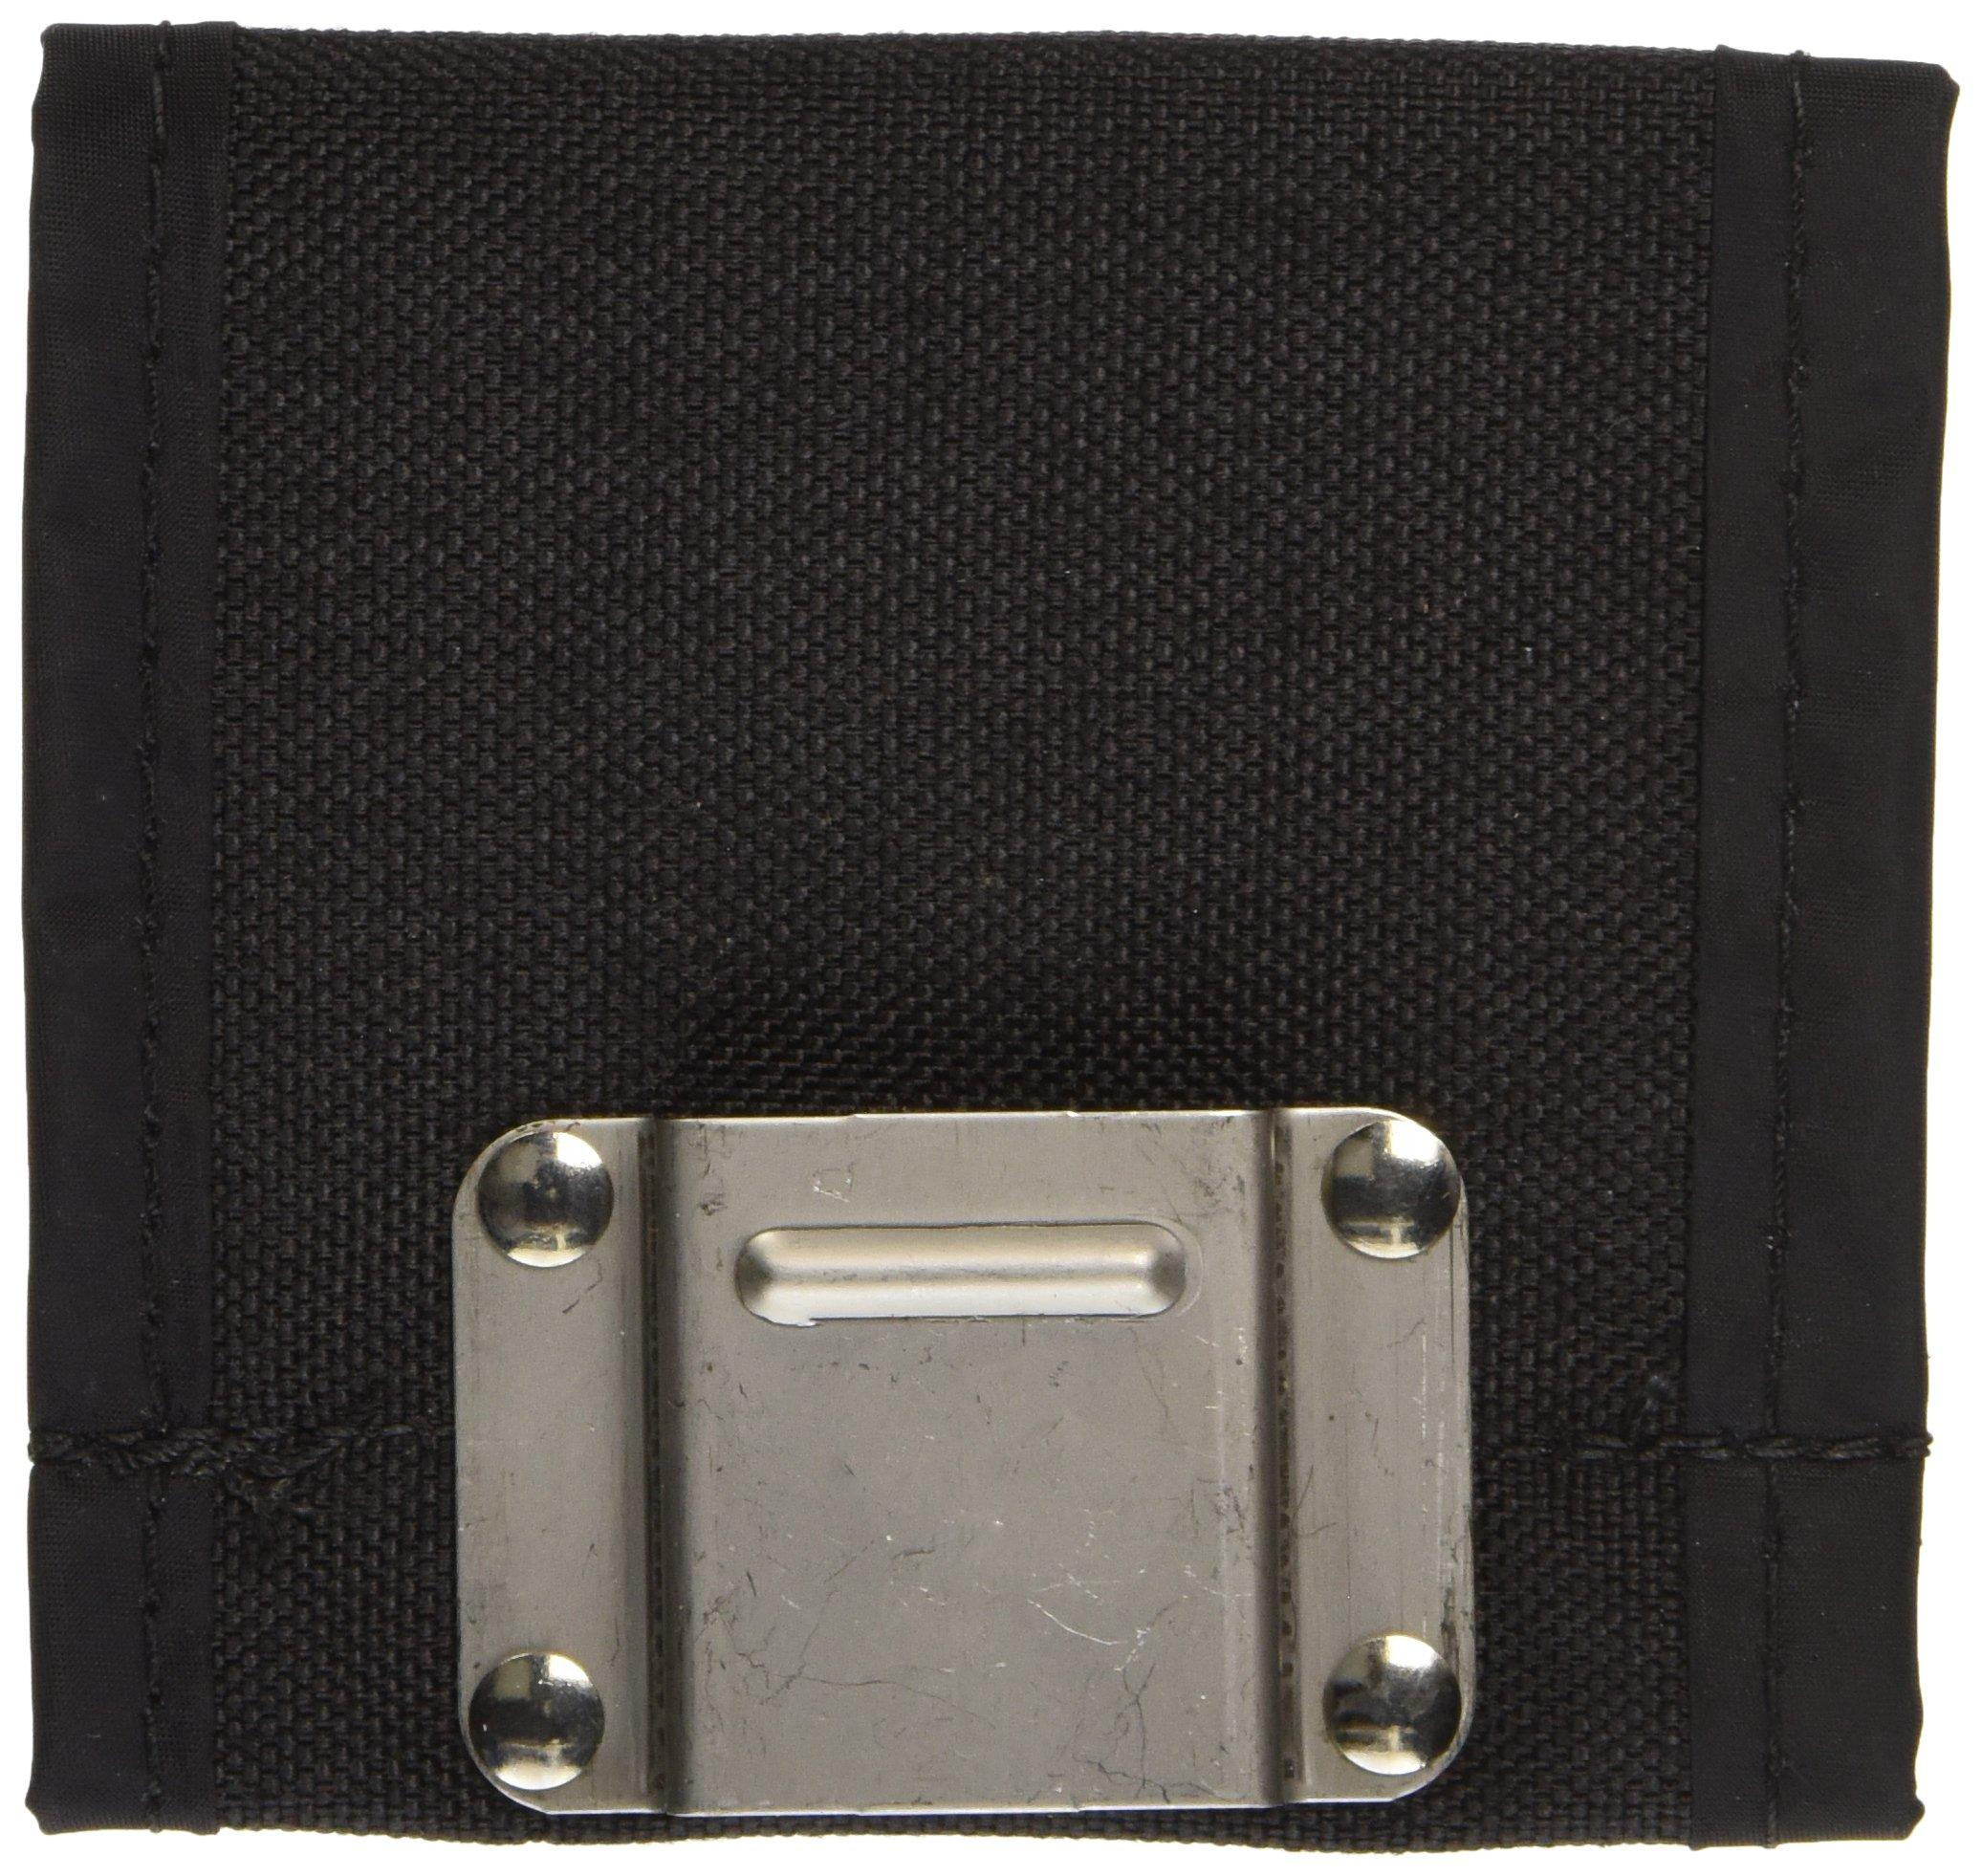 Tape Measure Holder, Heavy Duty Nylon, Tunnel Belt Fits 2.25-Inch, 4.125 x 2.25 x 3.75-Inch Klein Tools 5707